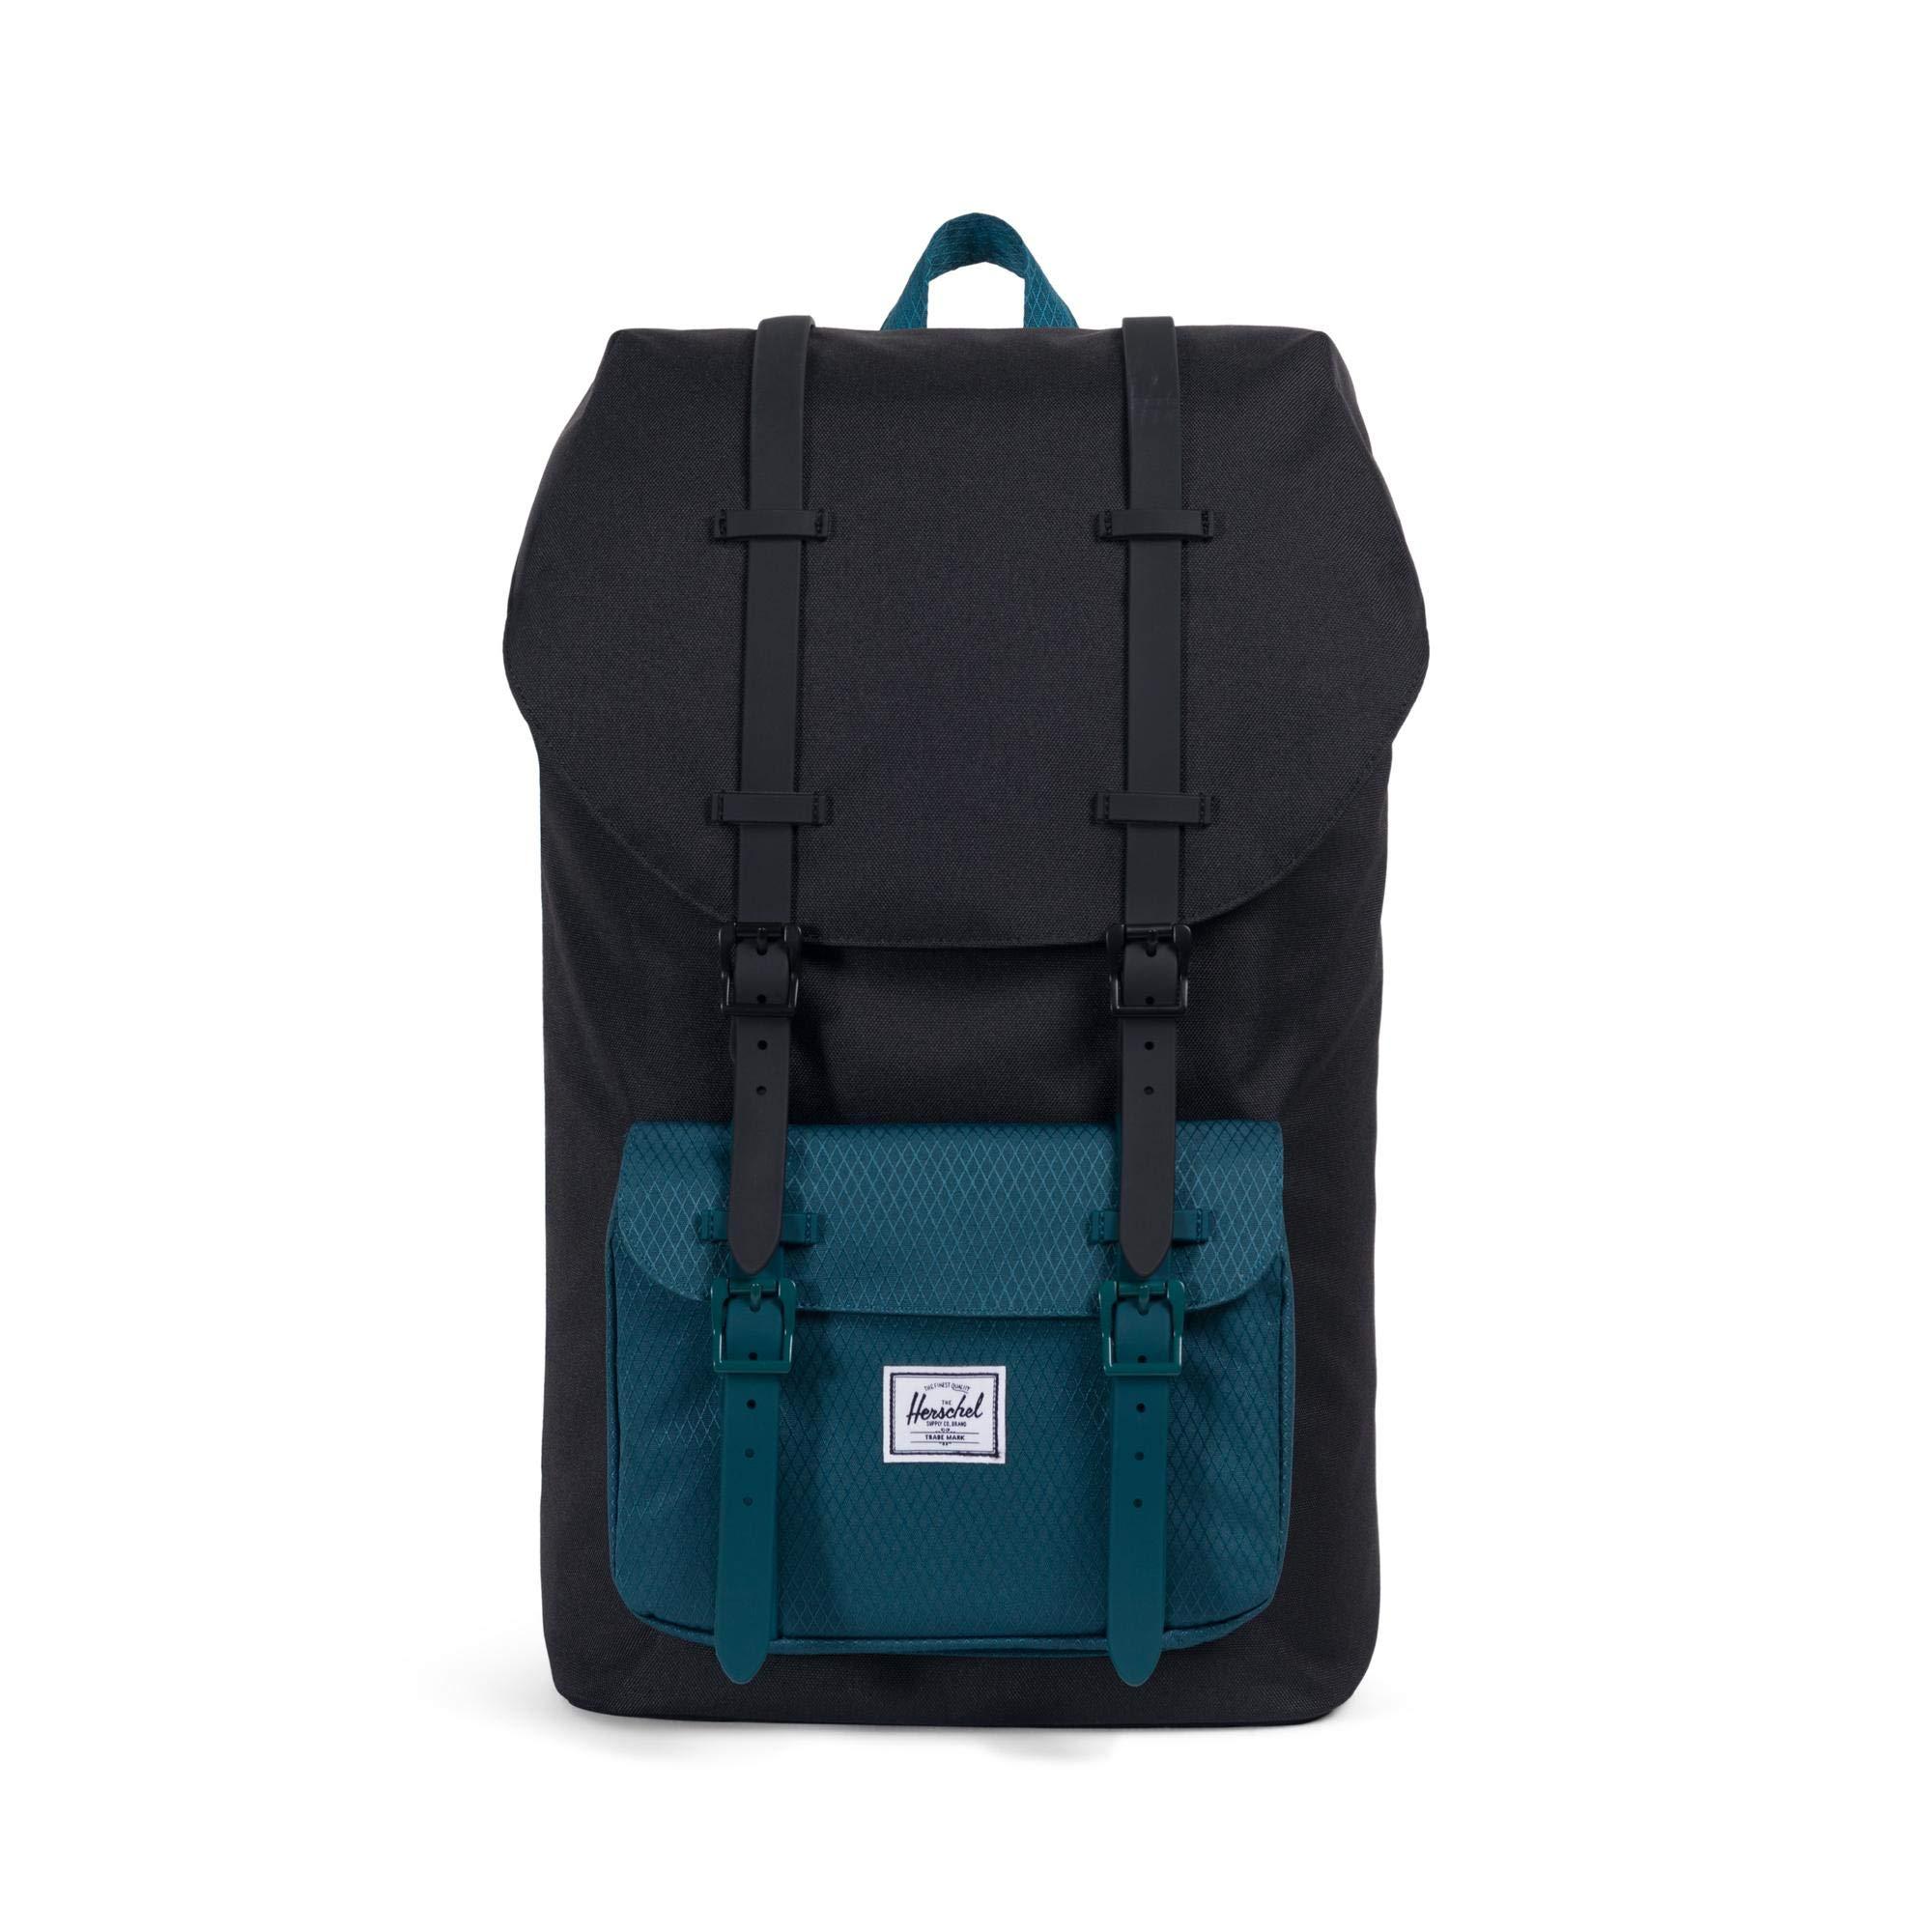 Herschel Little America Backpack Black/Deep Teal One Size